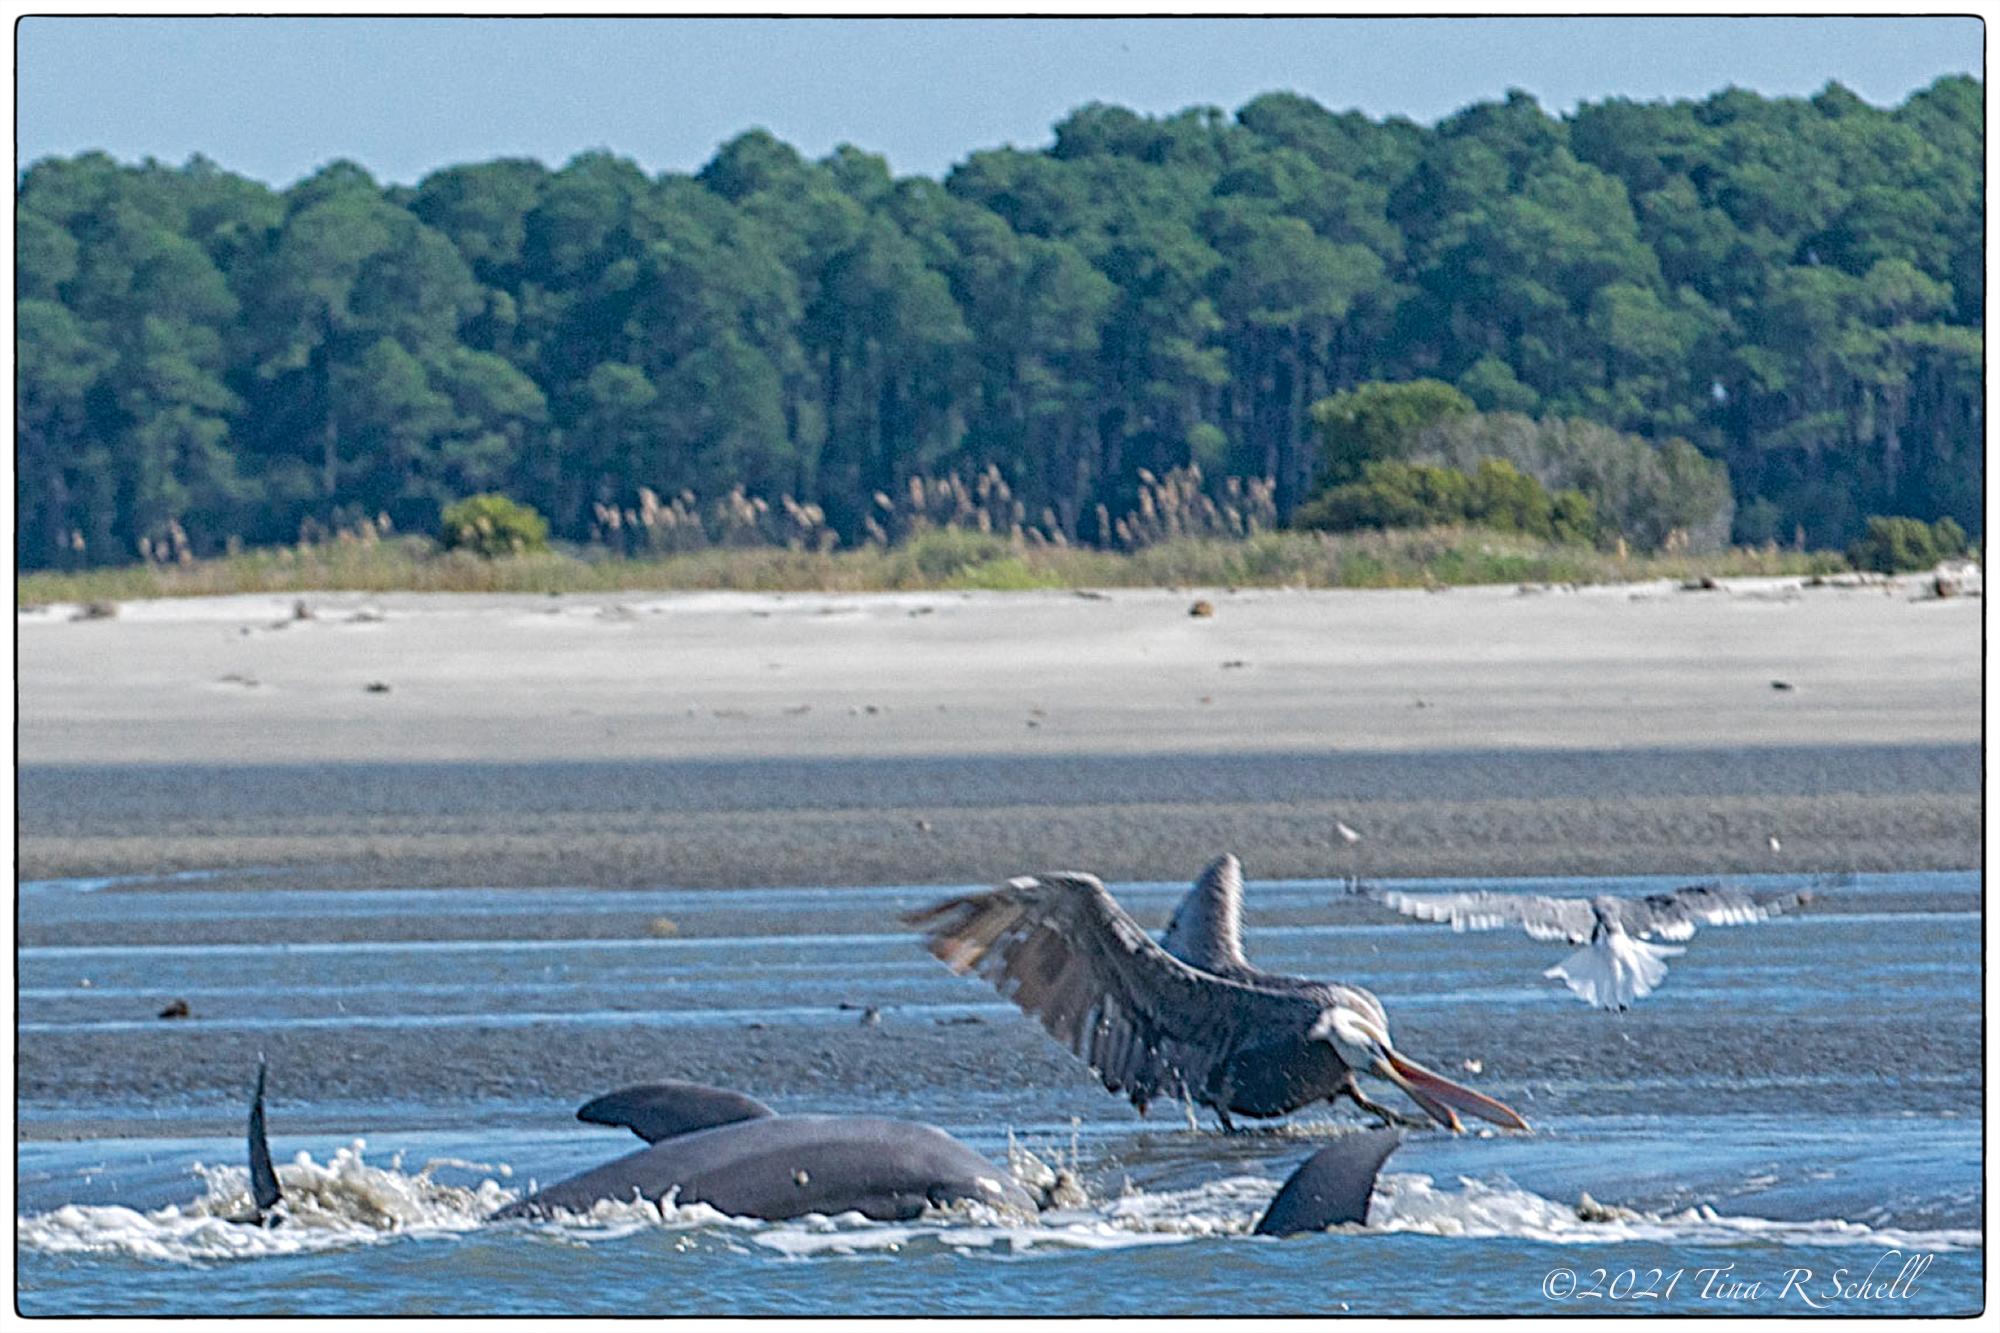 dolphins, pelican, strand feeding, Kiawah